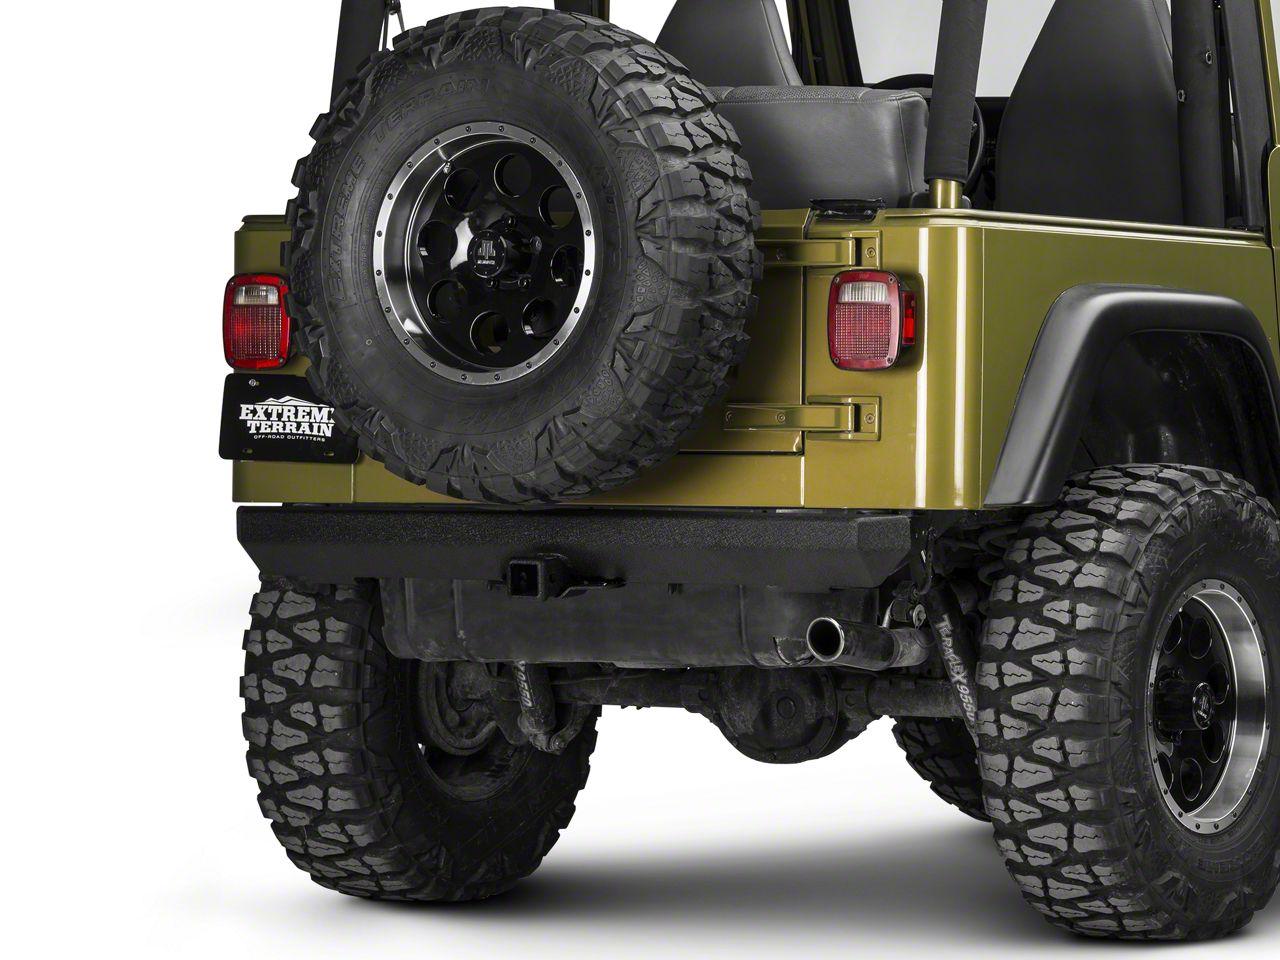 Smittybilt SRC Classic Rock Crawler Rear Bumper (87-06 Jeep Wrangler YJ & TJ)